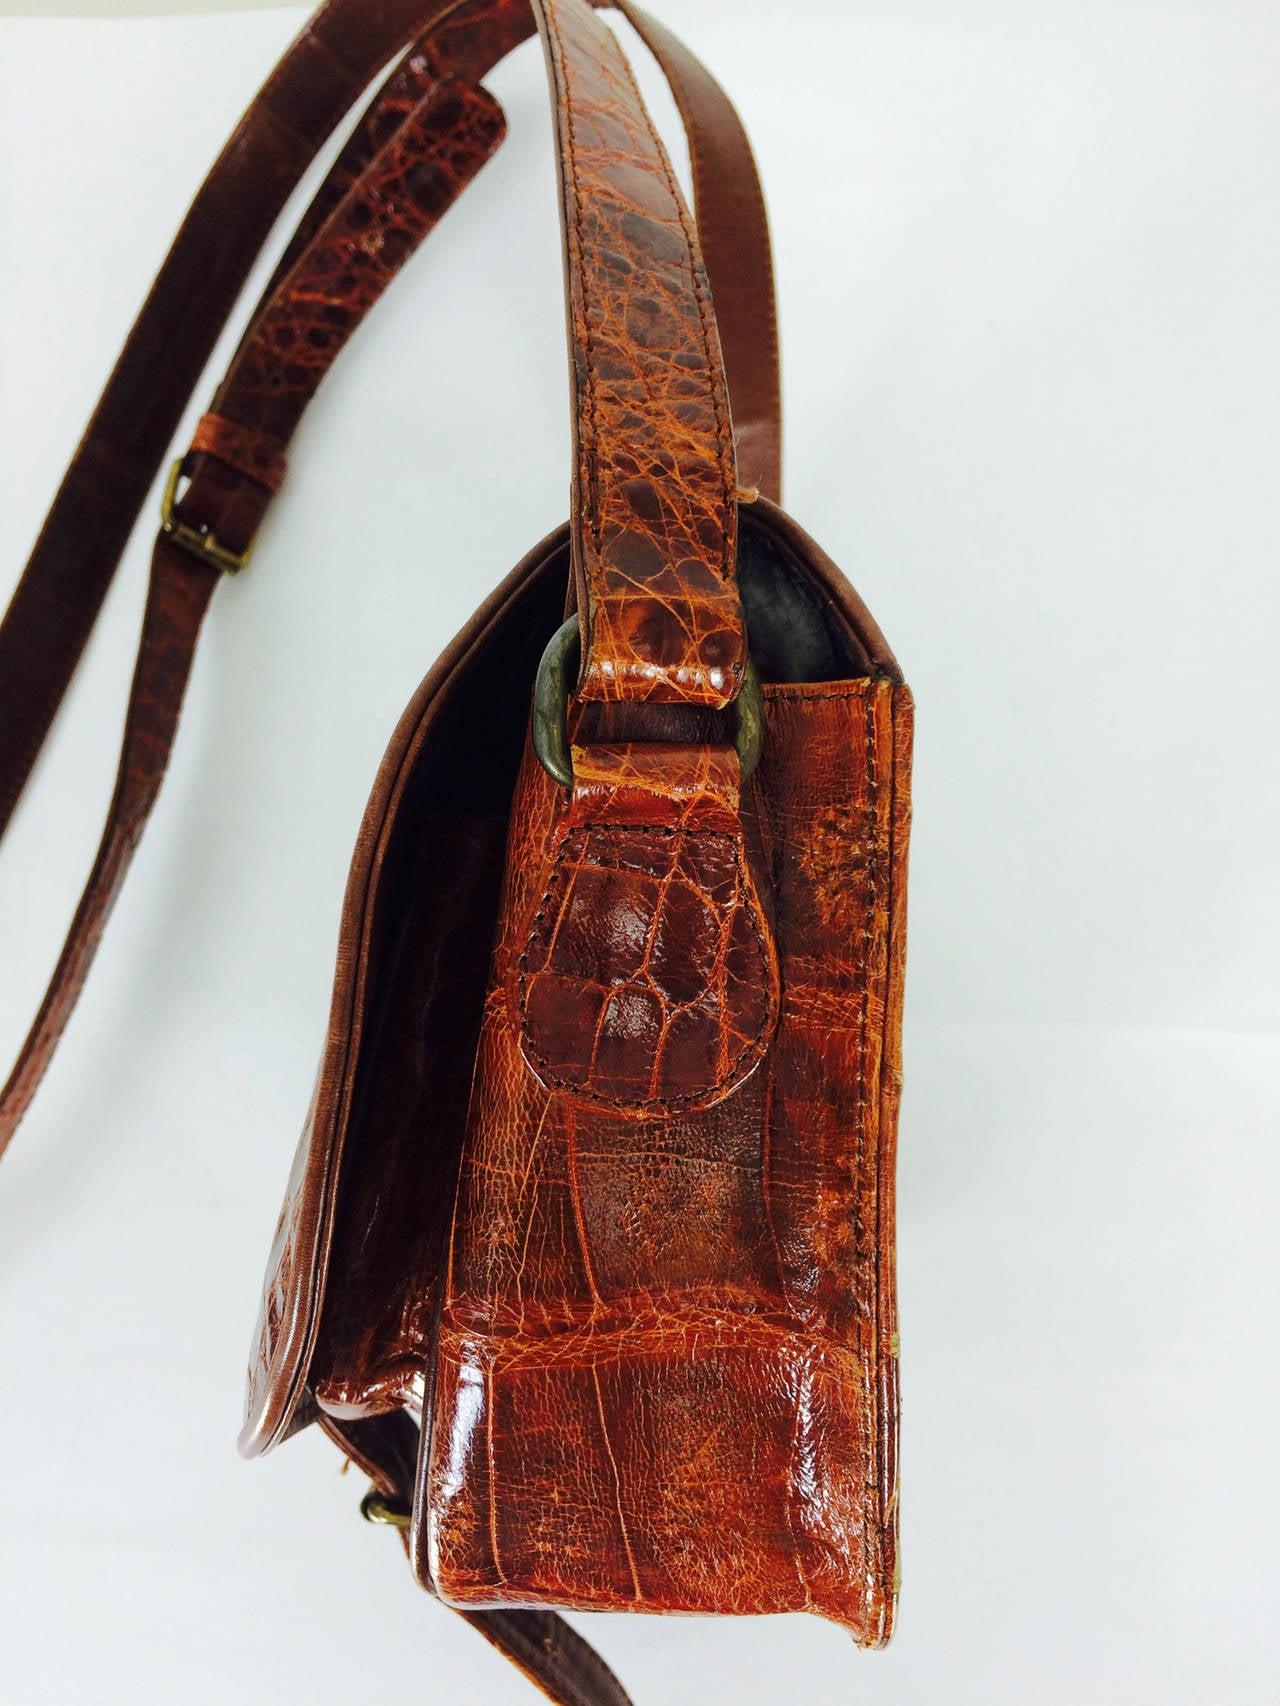 Saddle bag handbag cognac leather faux alligator Neiman Marcus 1980s 3